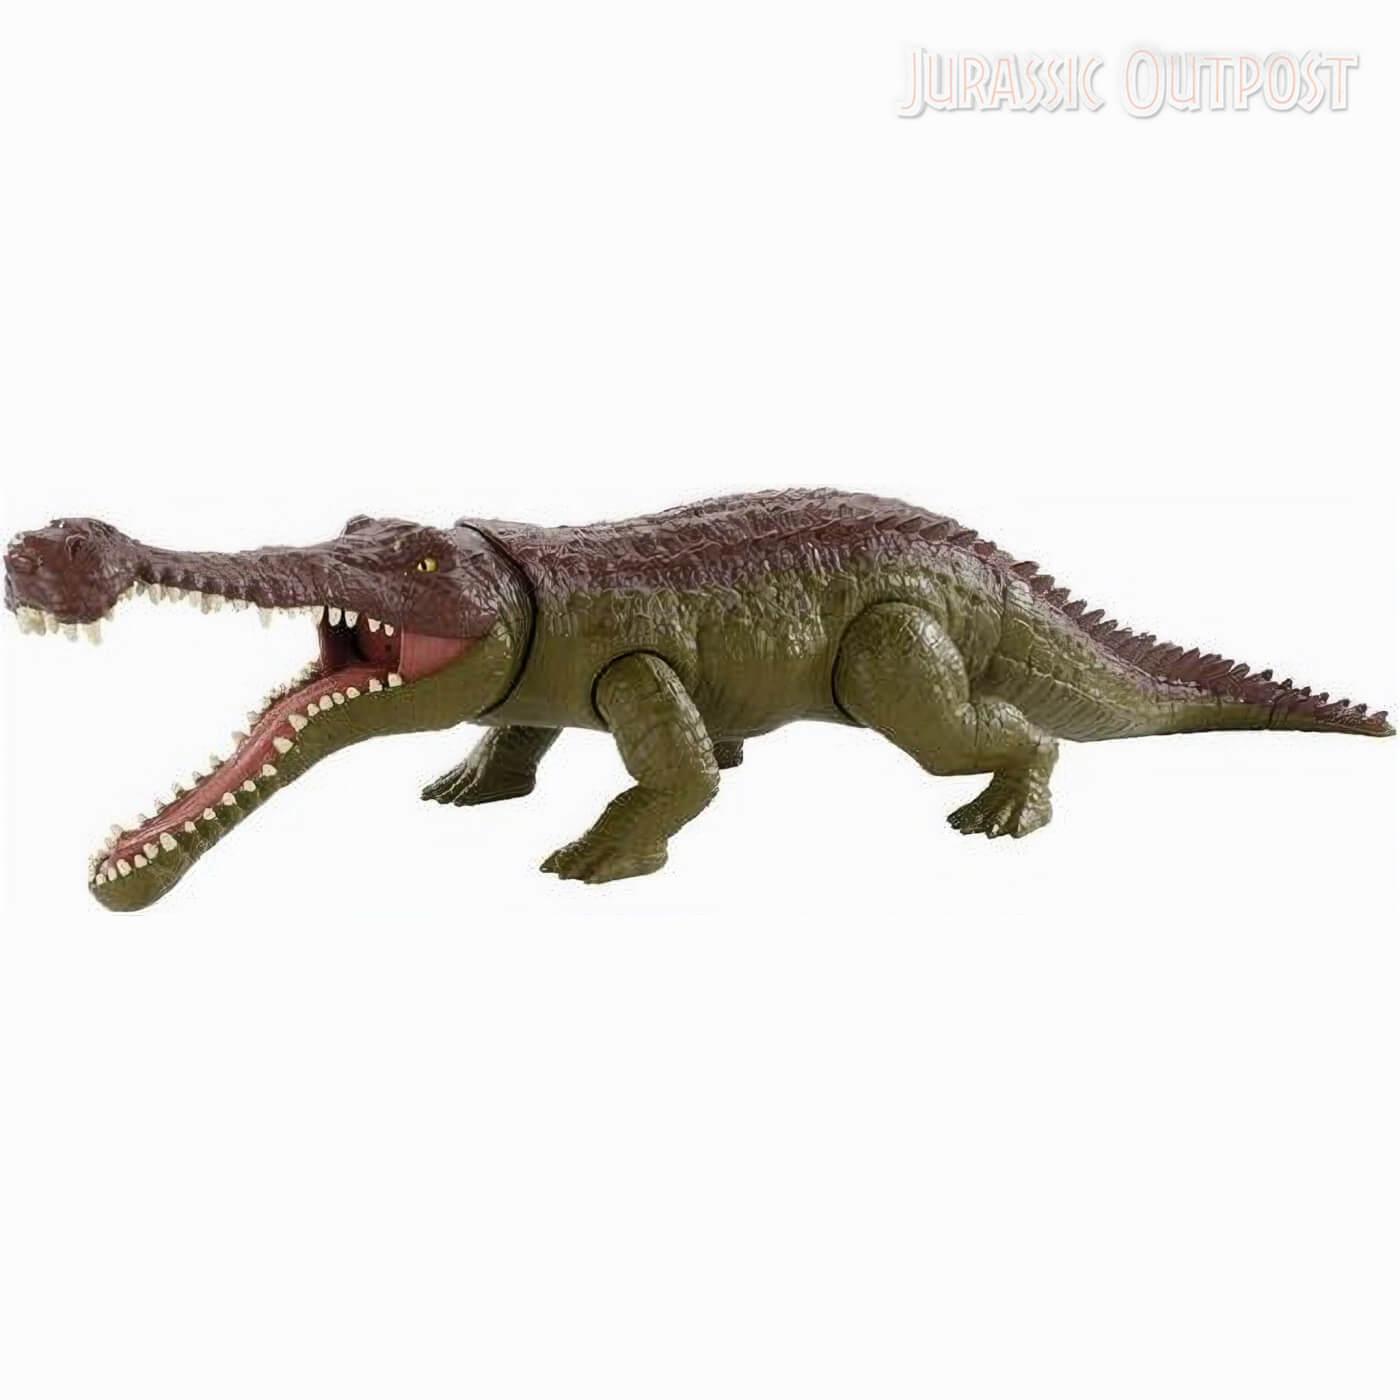 massive-biters-sarchosuchus-primal-attack-revealed.jpg